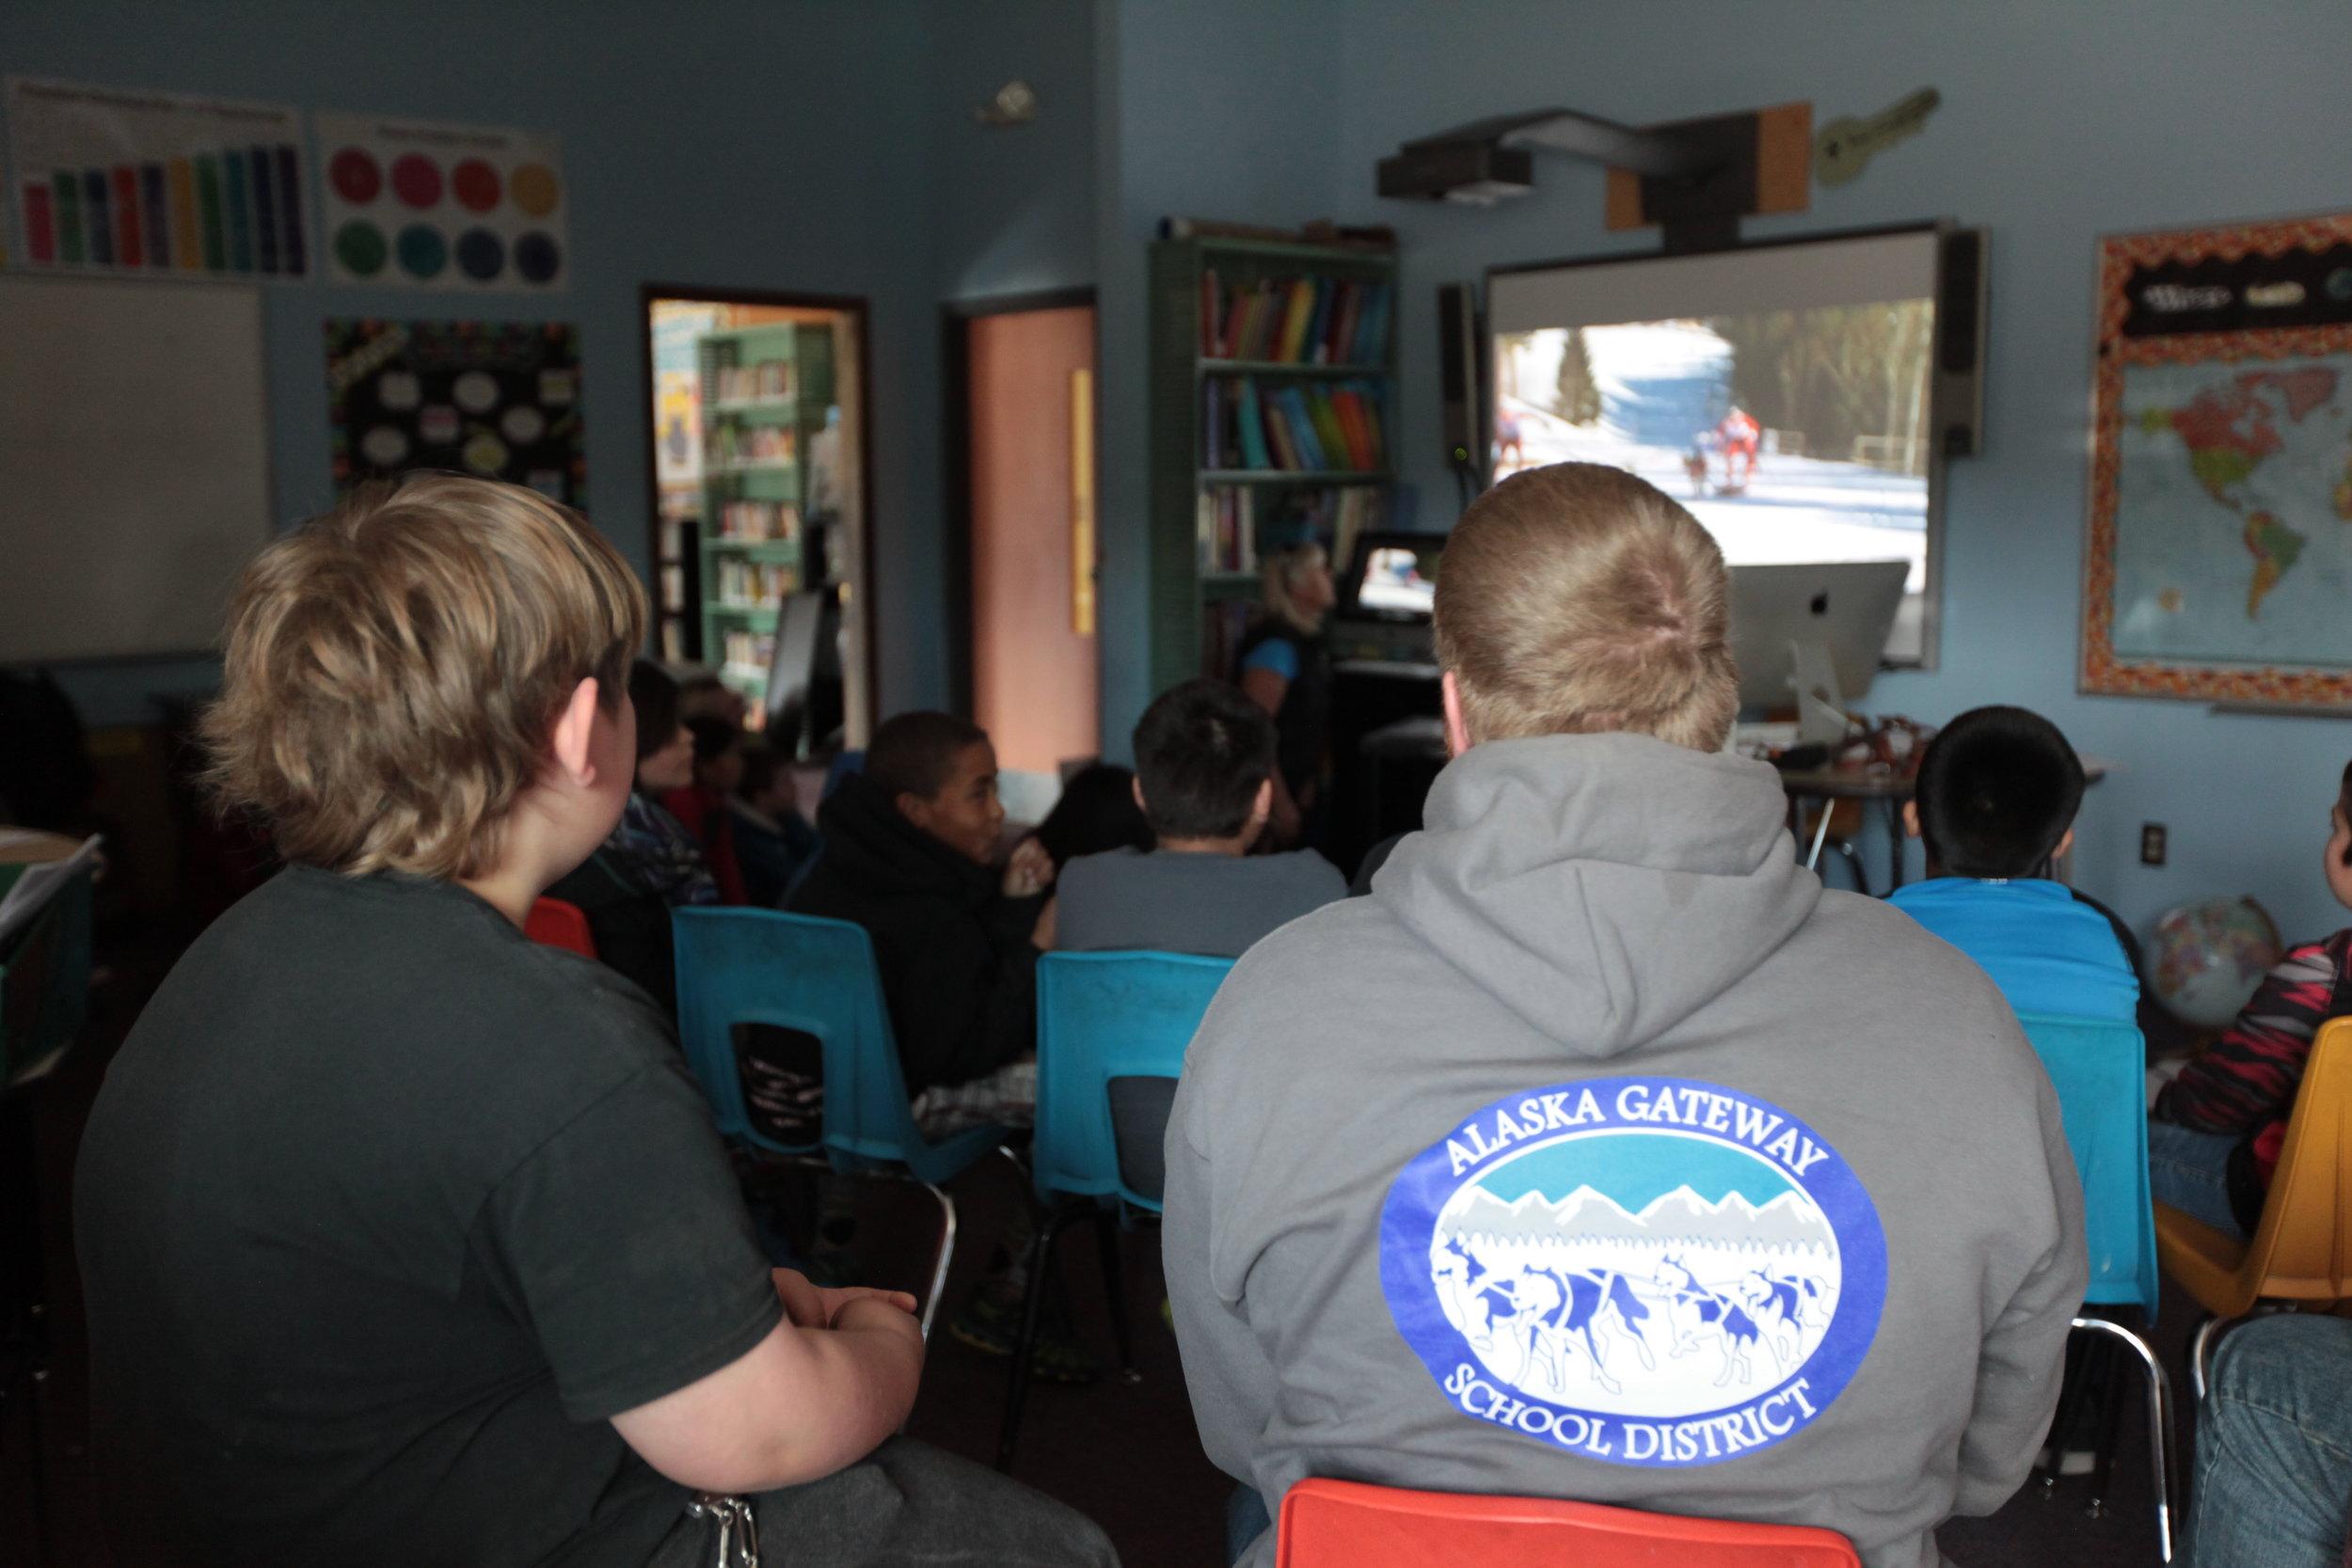 Eagle & Tanacross students listen to Quest guest speaker in classroom.